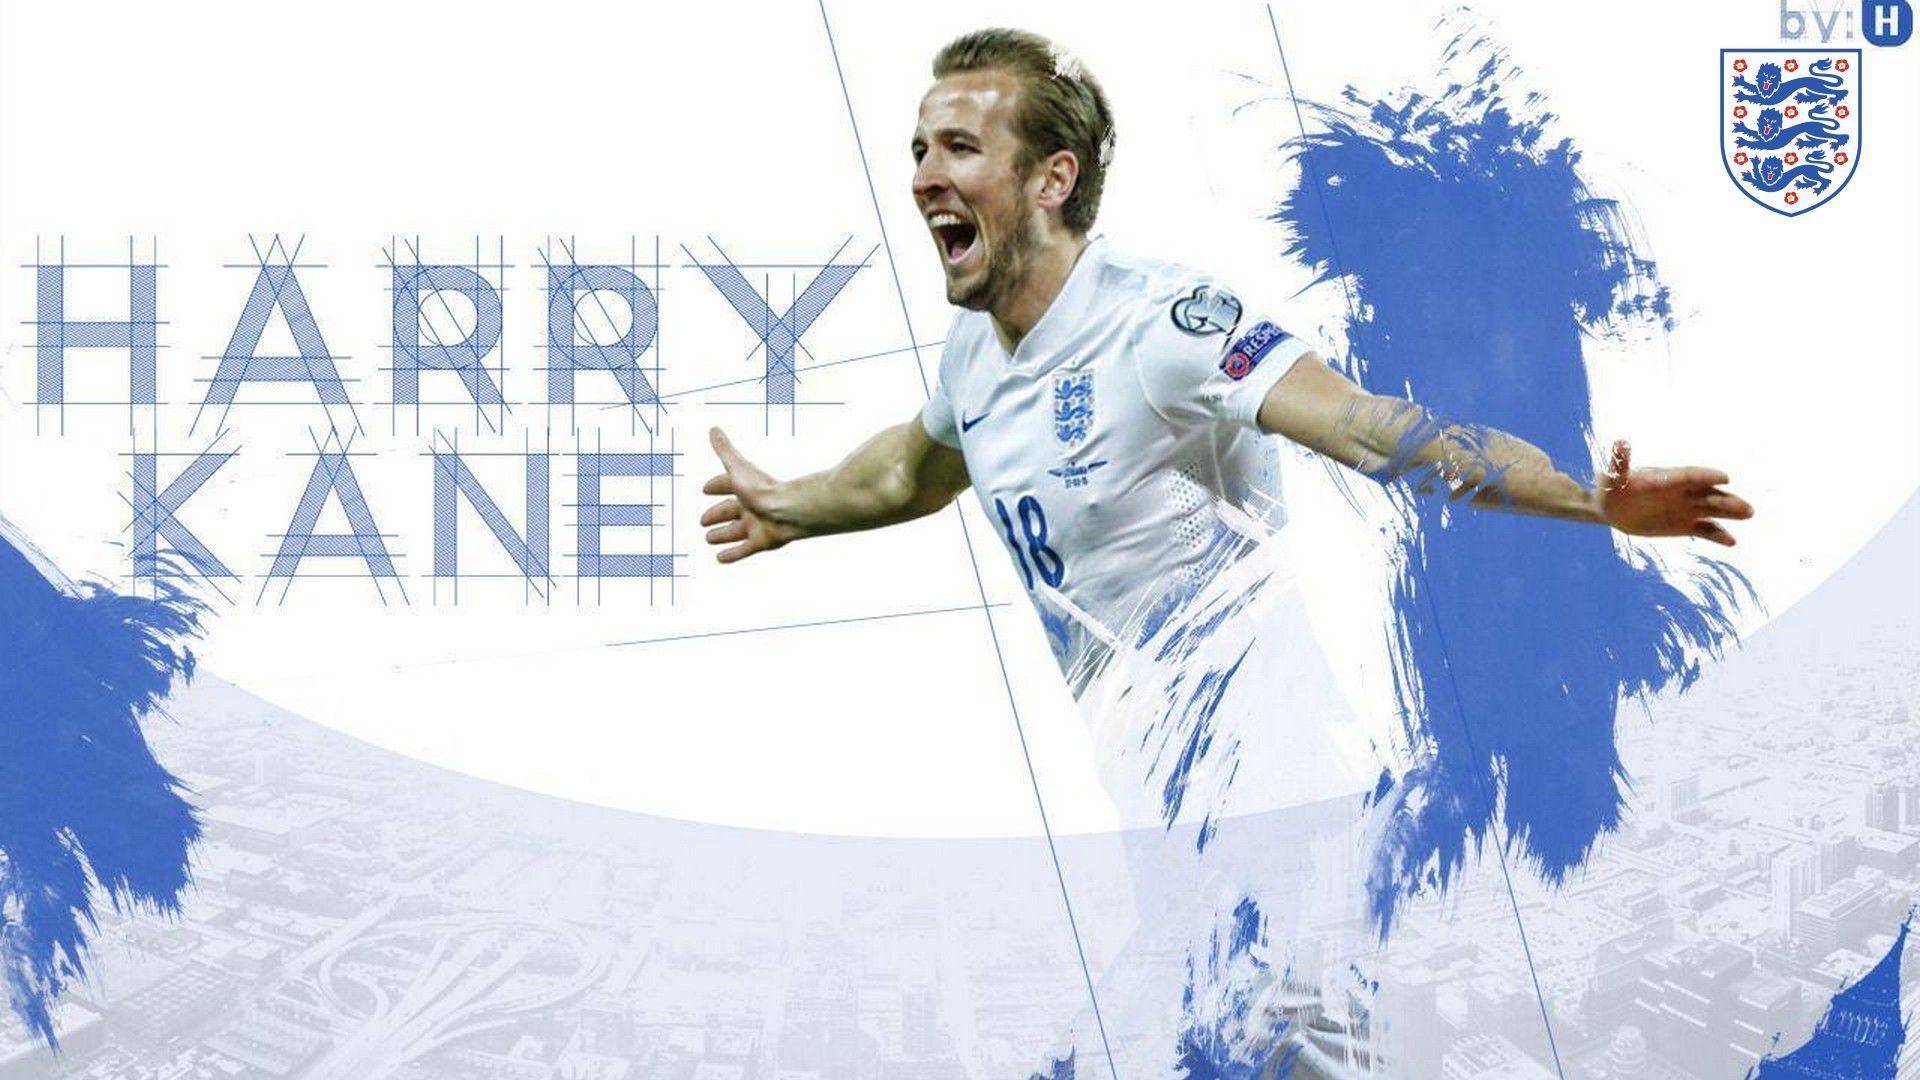 Harry Kane England Wallpapers